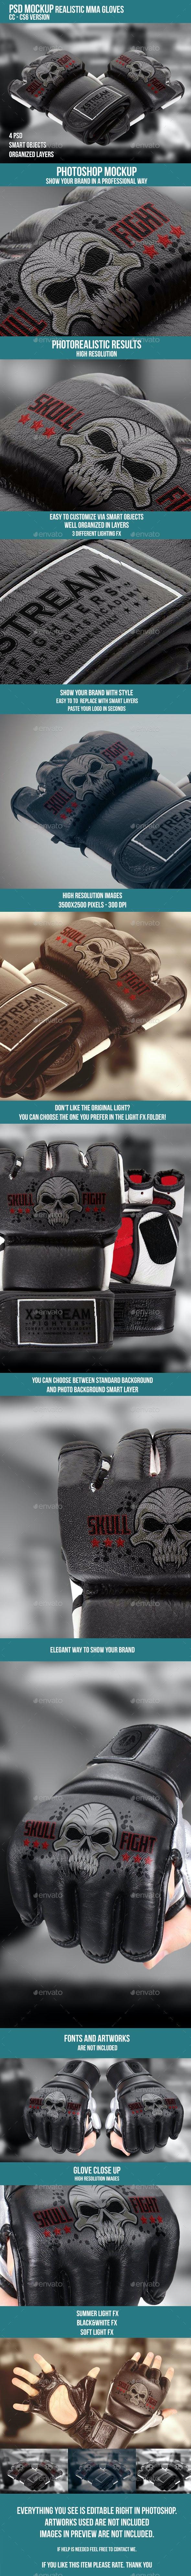 Mma Gloves PSD Mockup - Product Mock-Ups Graphics